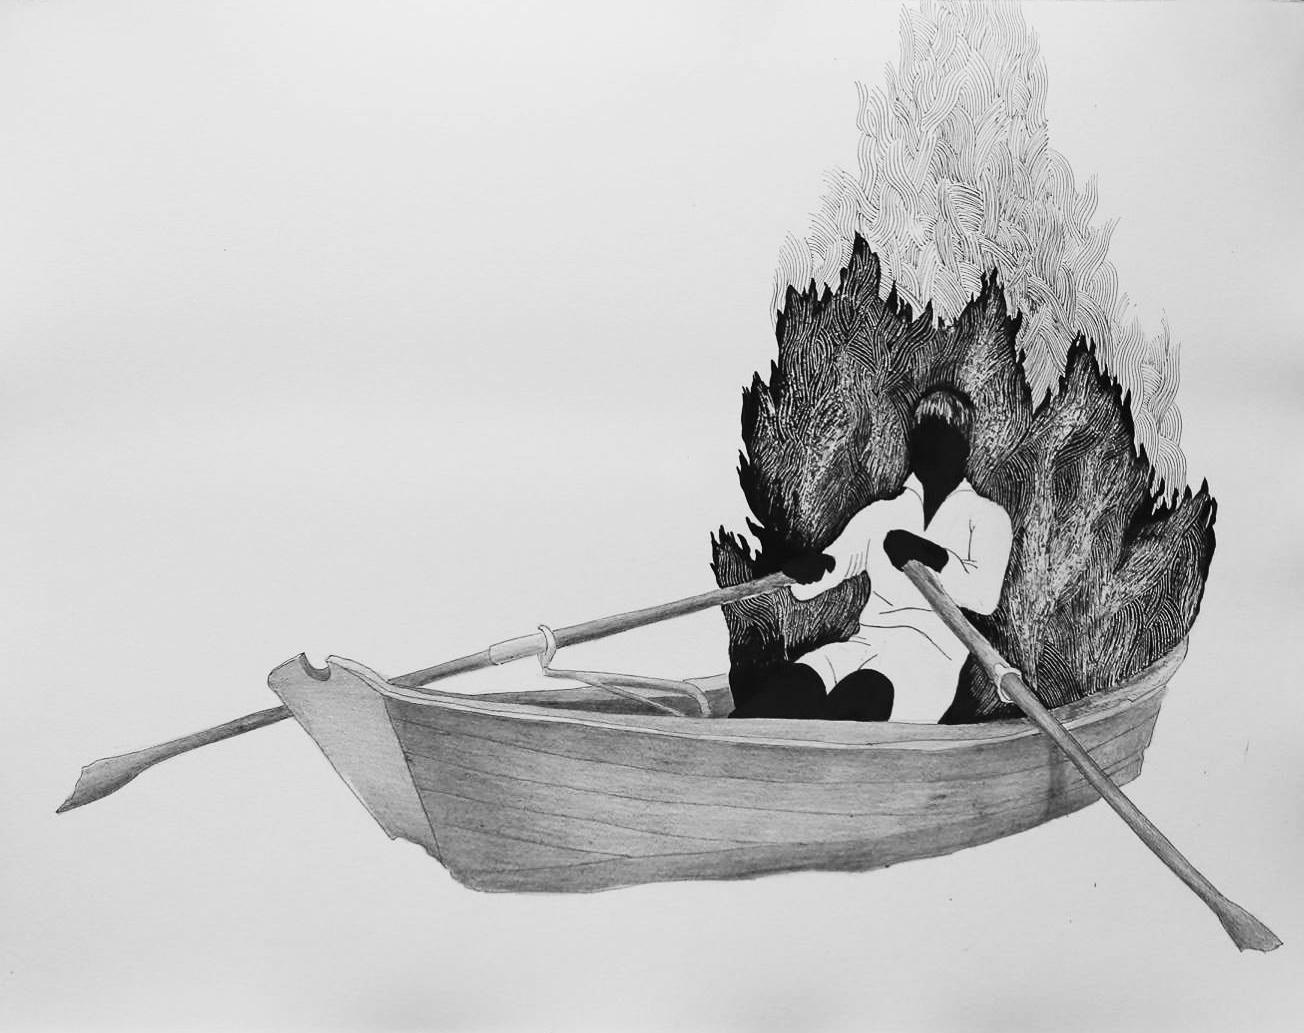 Maria Corejova, Days of Anger, 64x50 cm, Tusche auf Papier, 2016